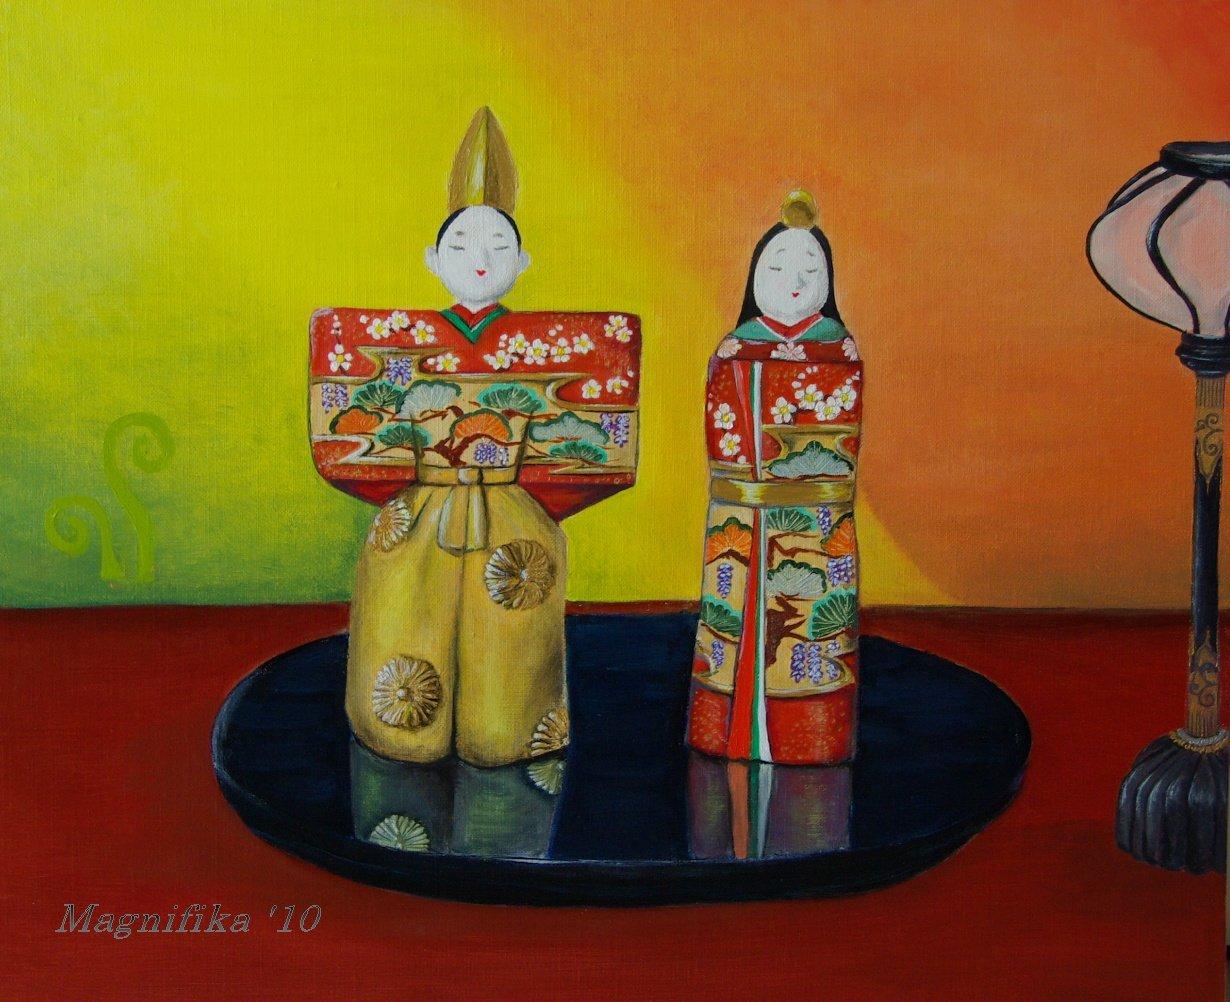 my gallery 24: 雛祭り Doll Festival ©_e0140365_1013172.jpg